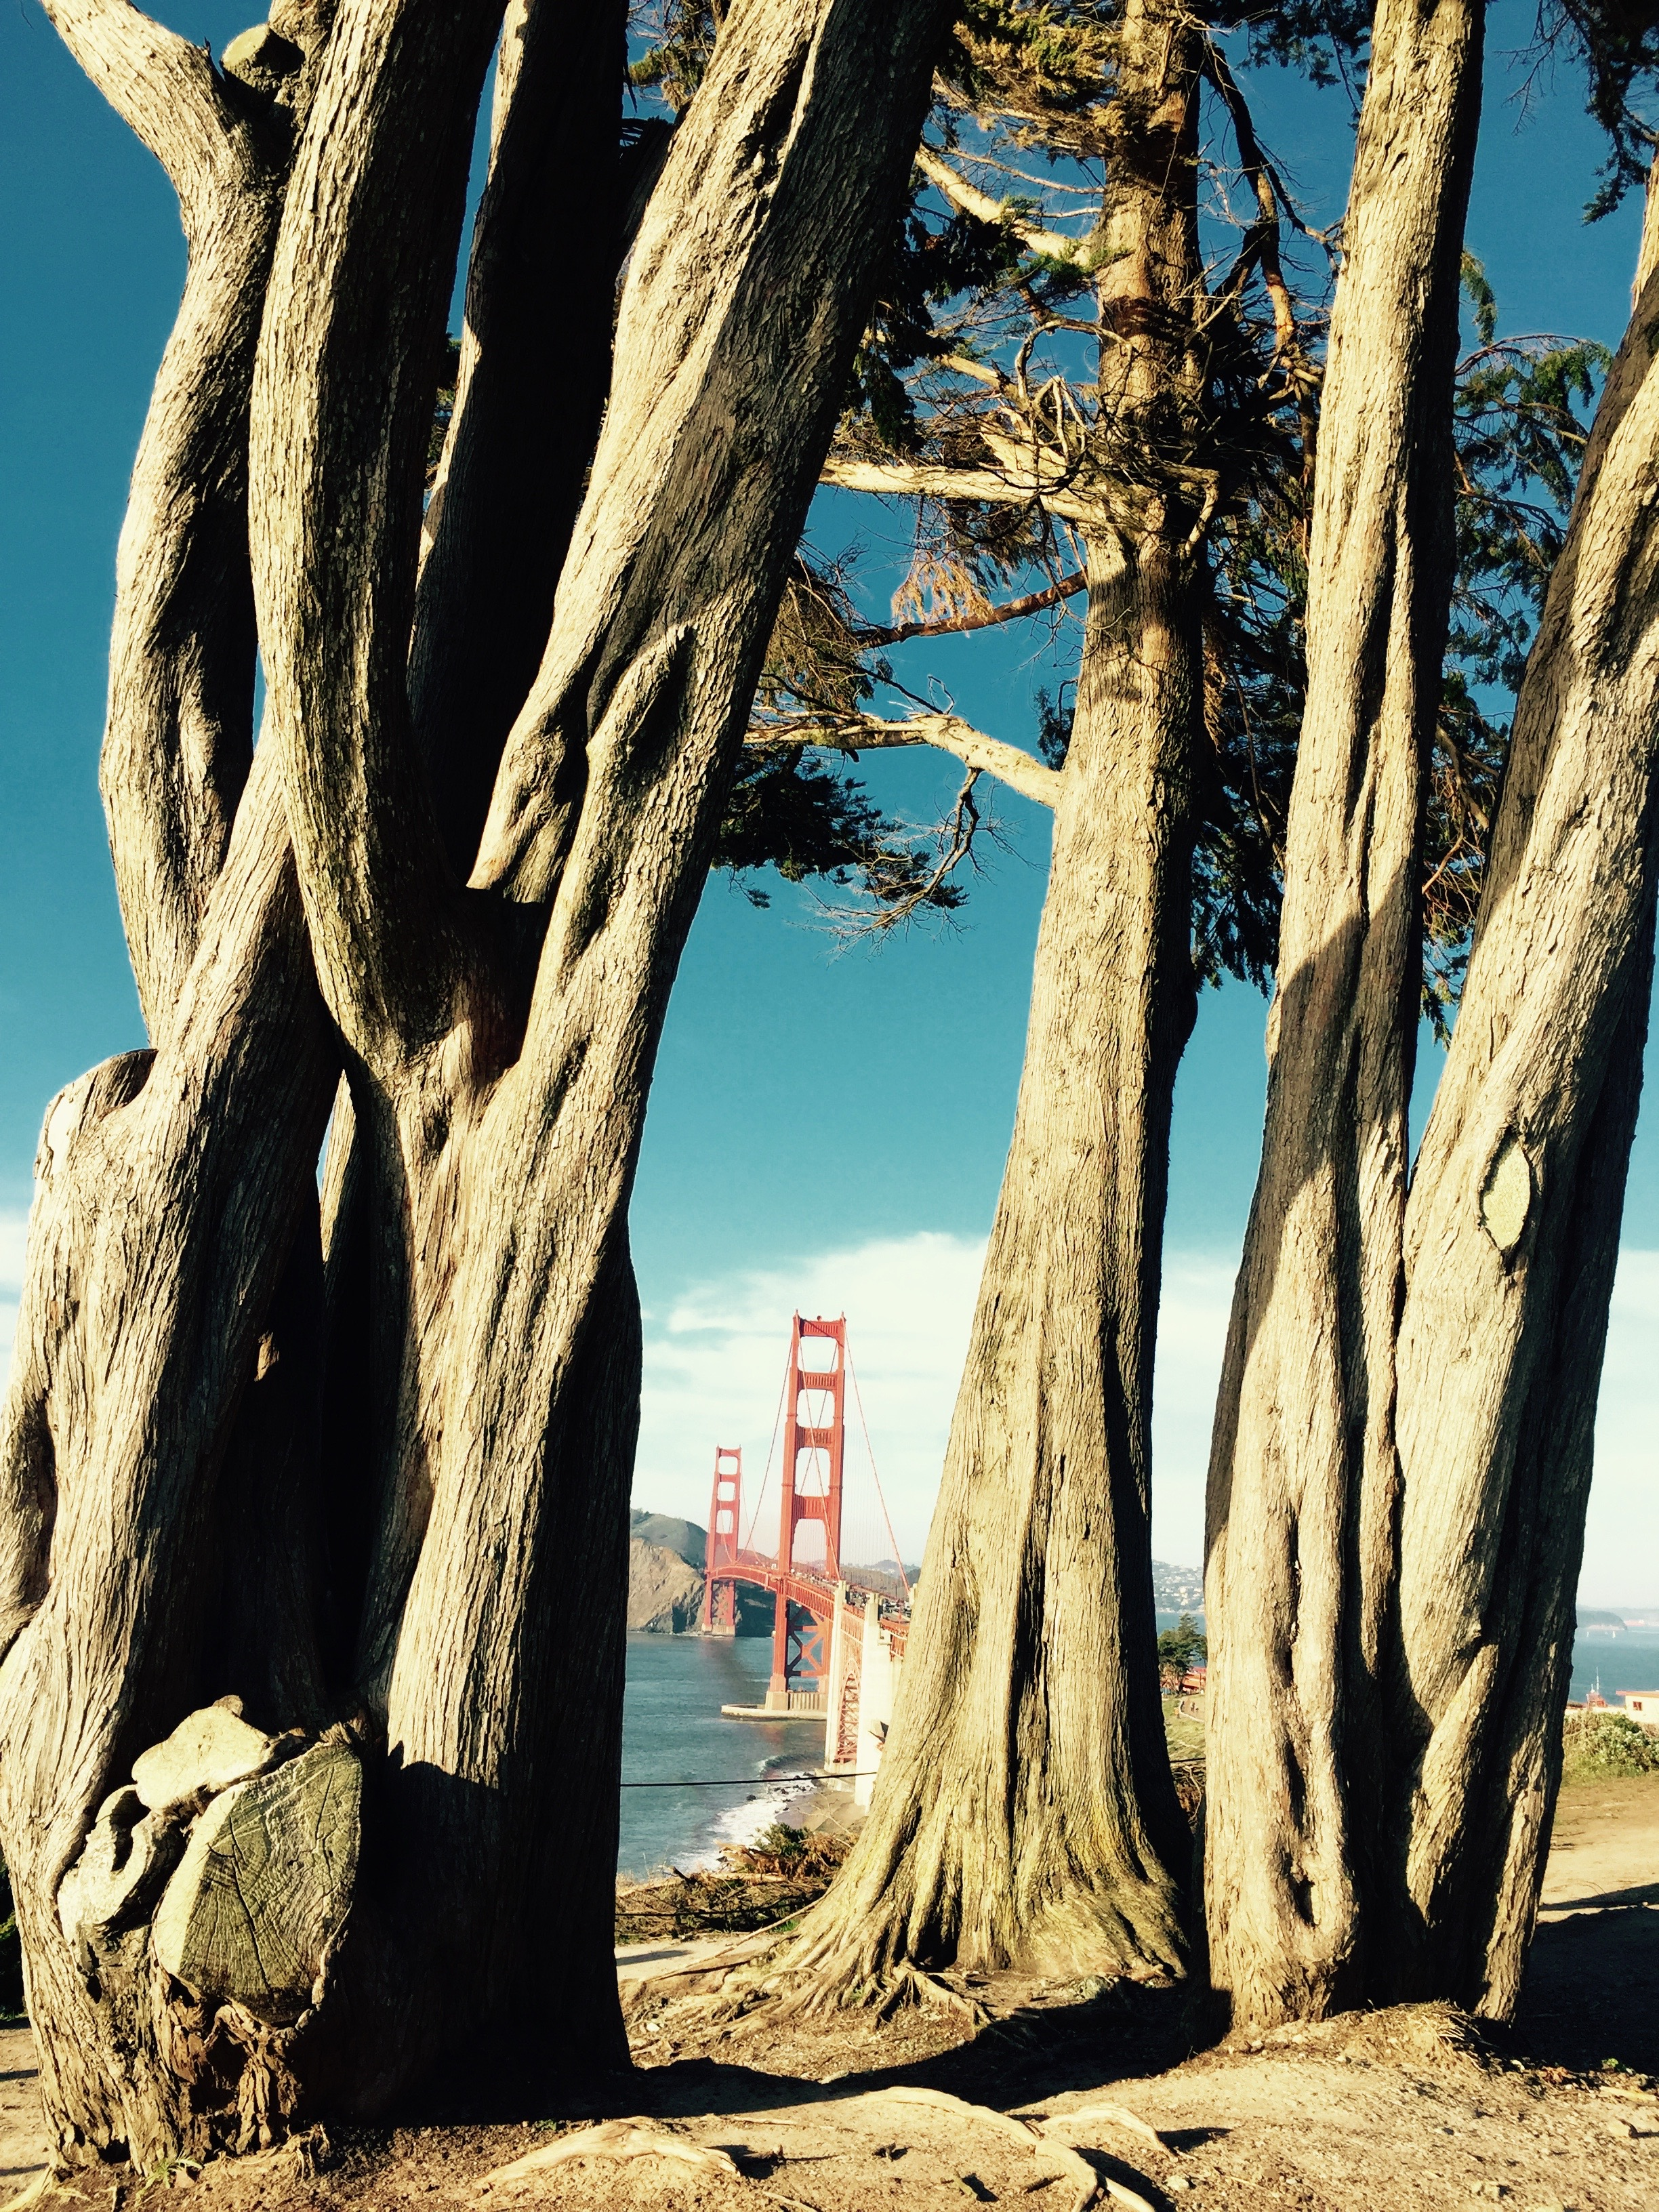 View of the Golden Gate Bridge, San Francisco California - 3 Days*